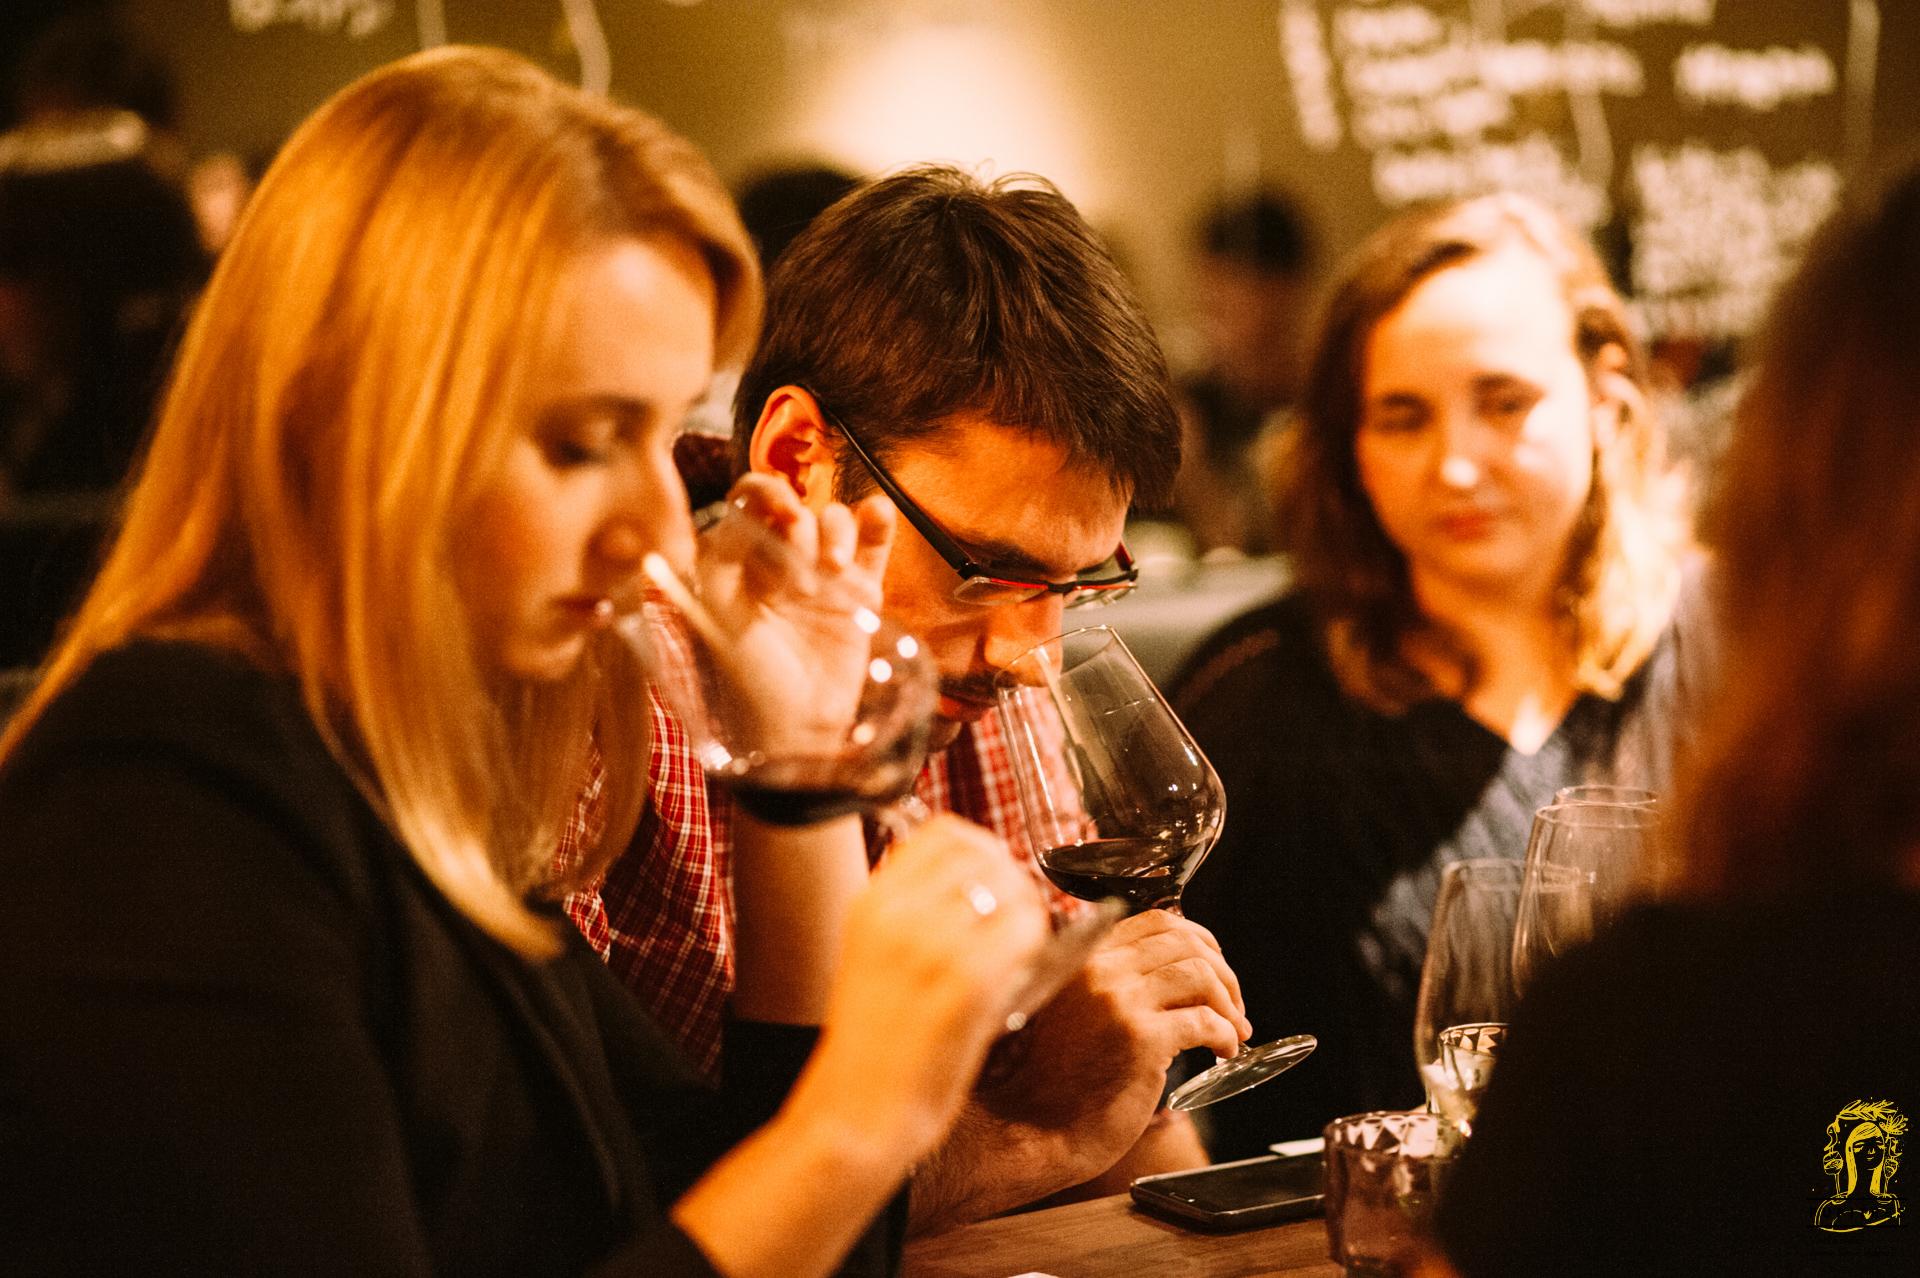 sljubljivanje vina i hrane